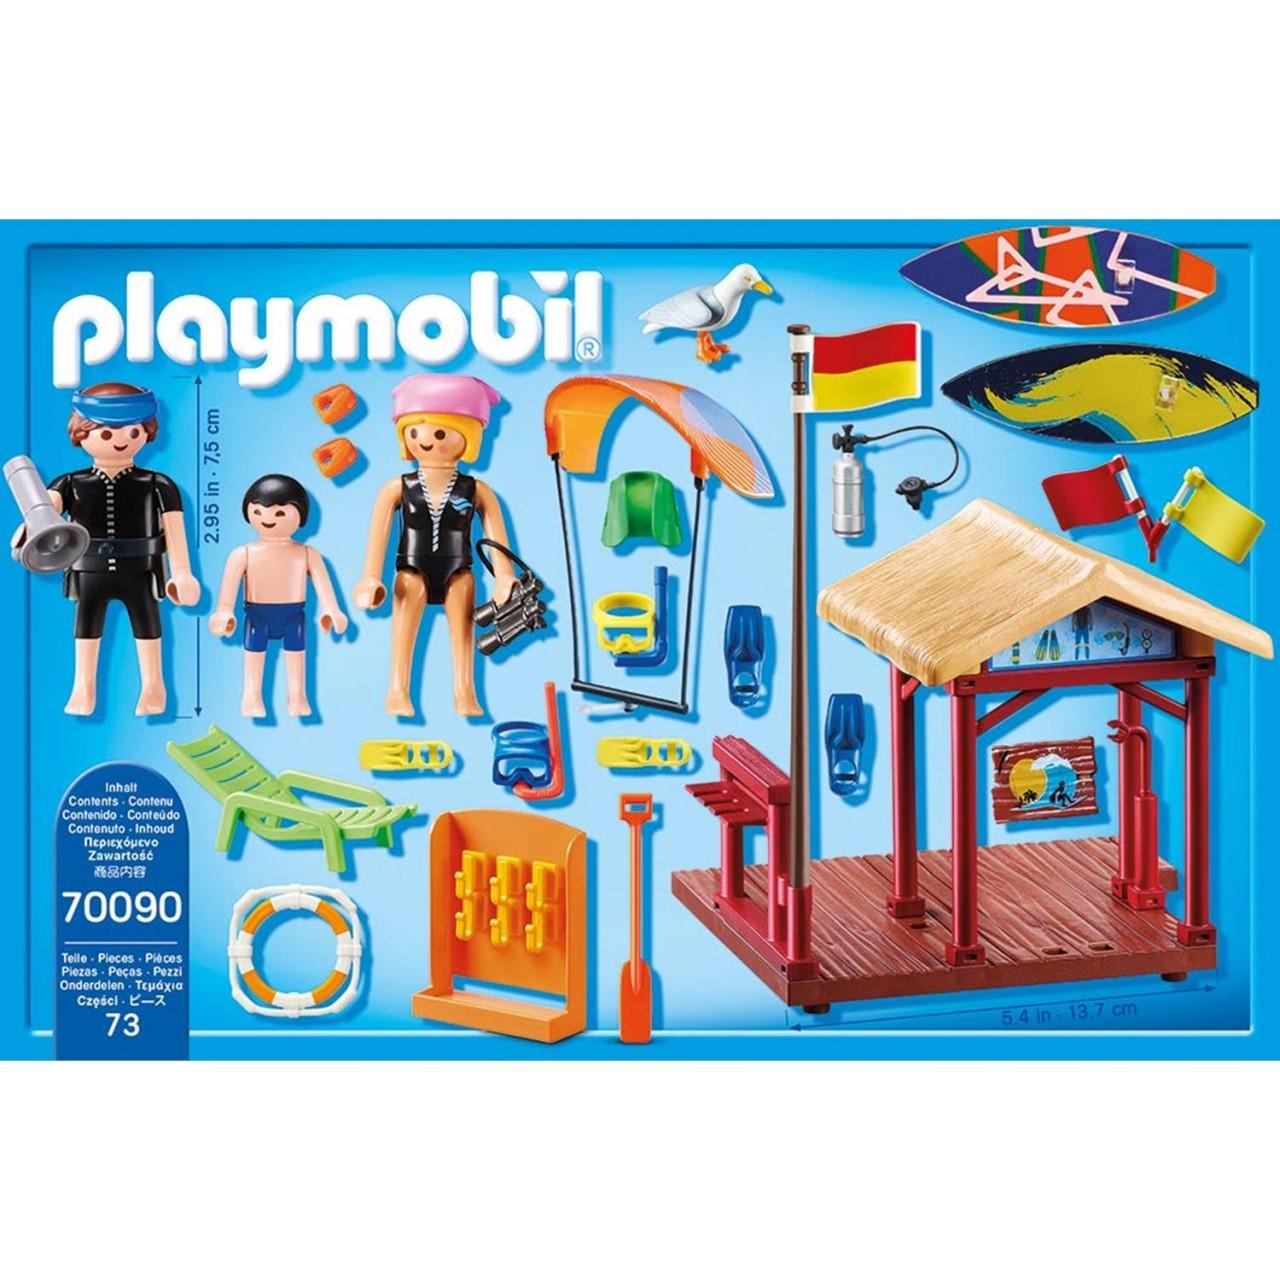 Playmobil 70090 Wassersport-Schule